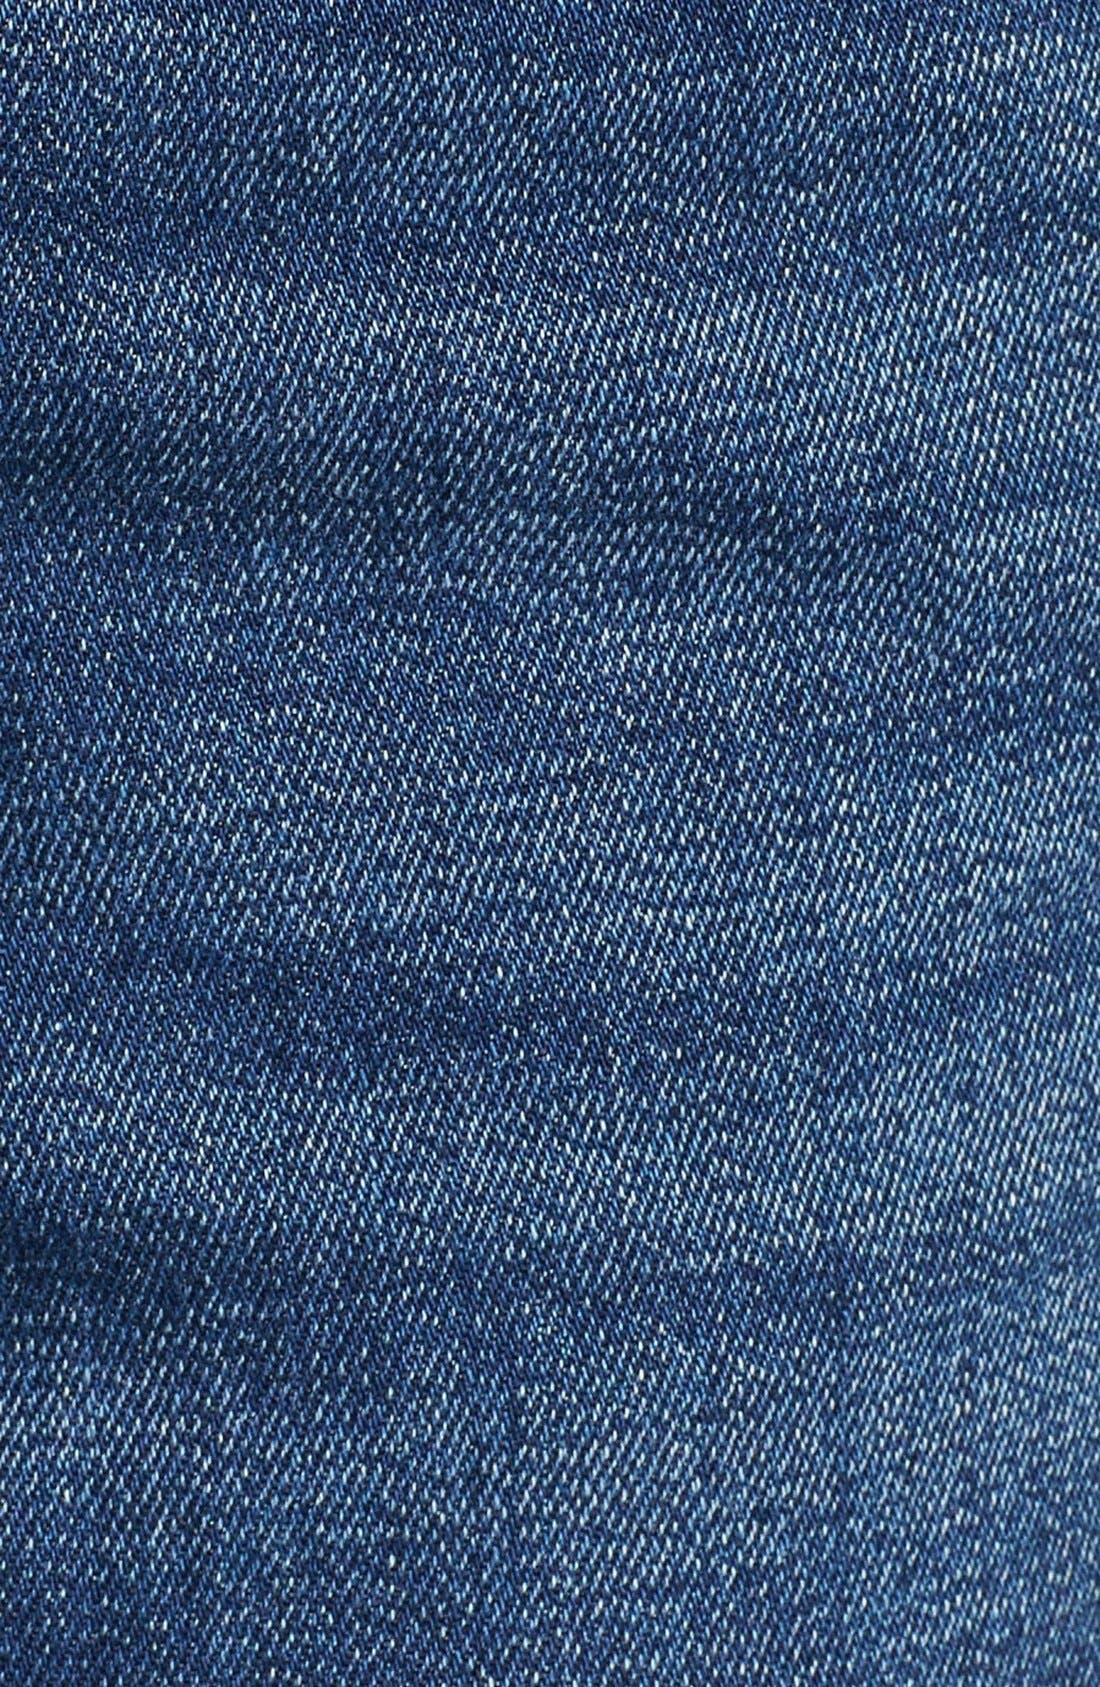 'Highly Vibed' Cutoff Denim Shorts,                             Alternate thumbnail 5, color,                             Classic Indigo